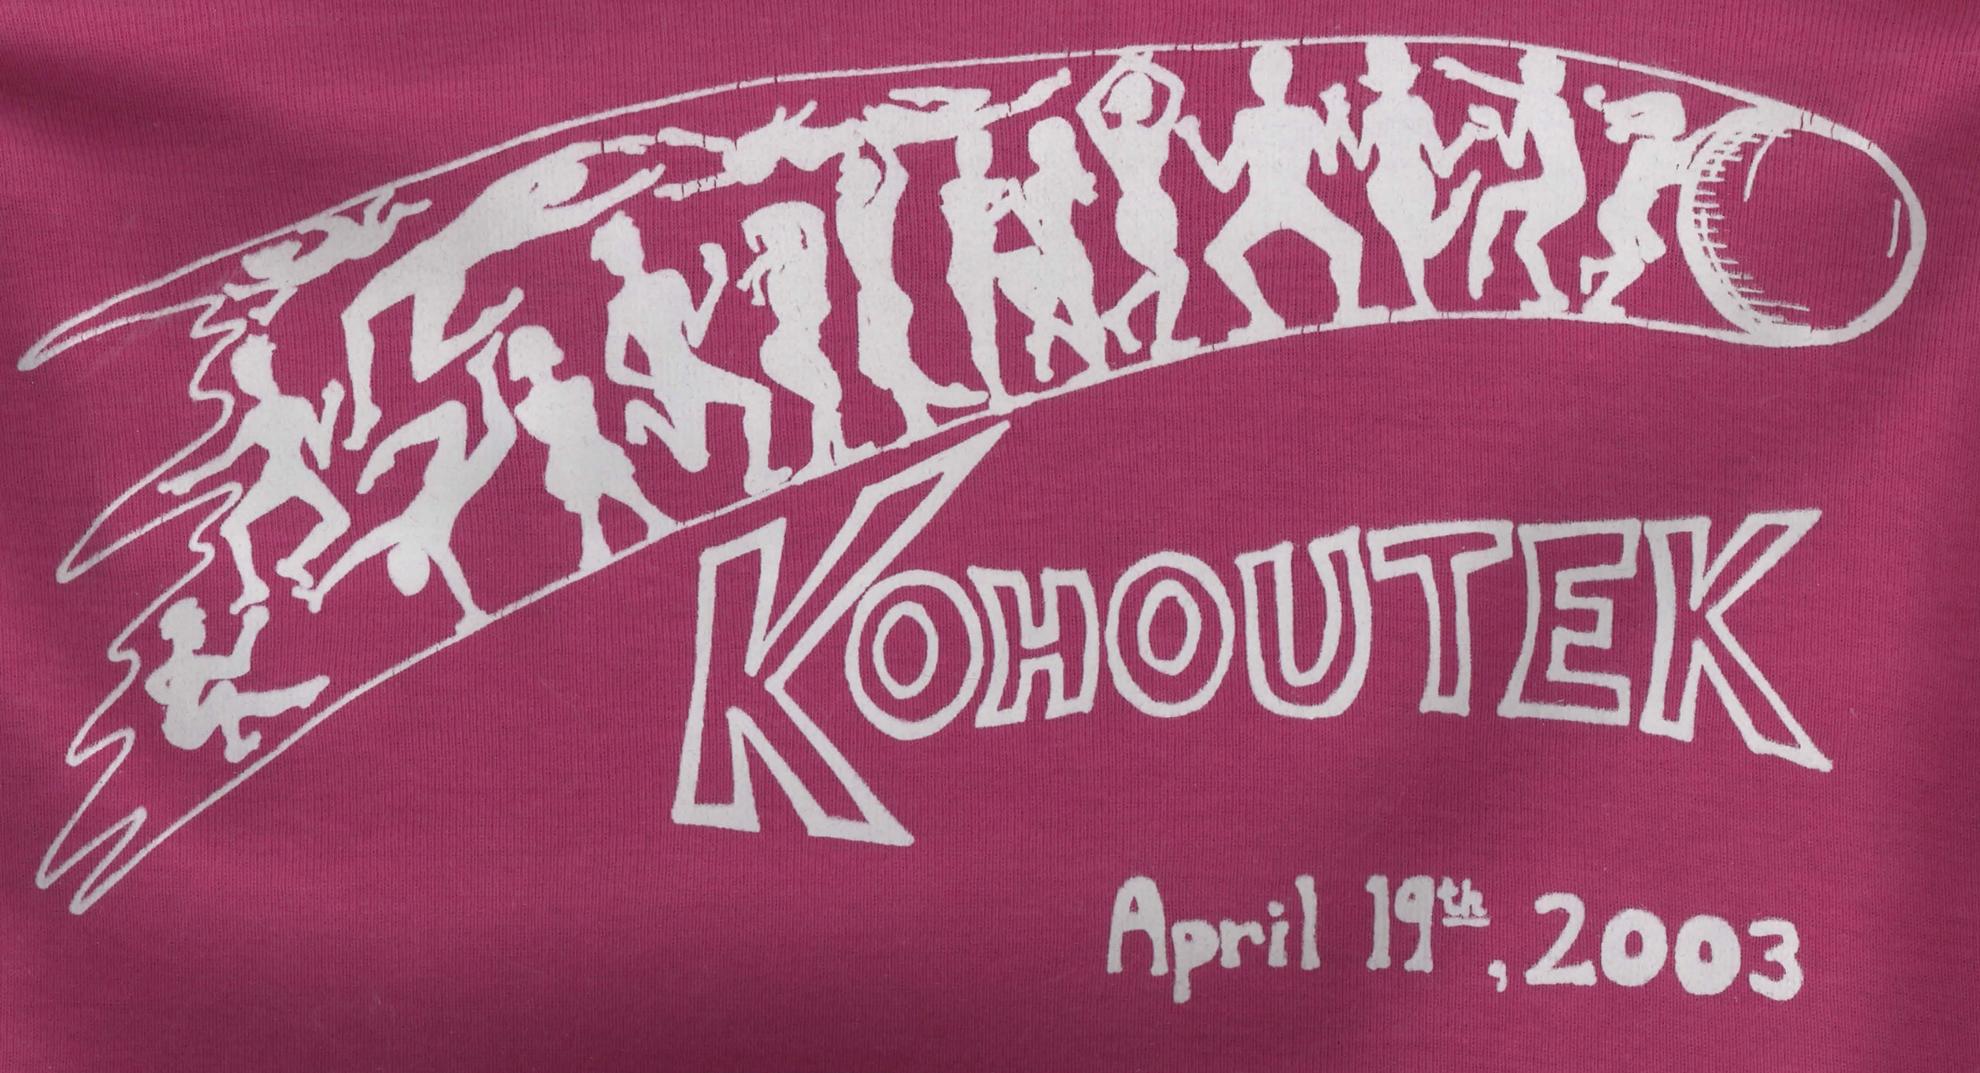 kohoutek 2003 tshirt-pink